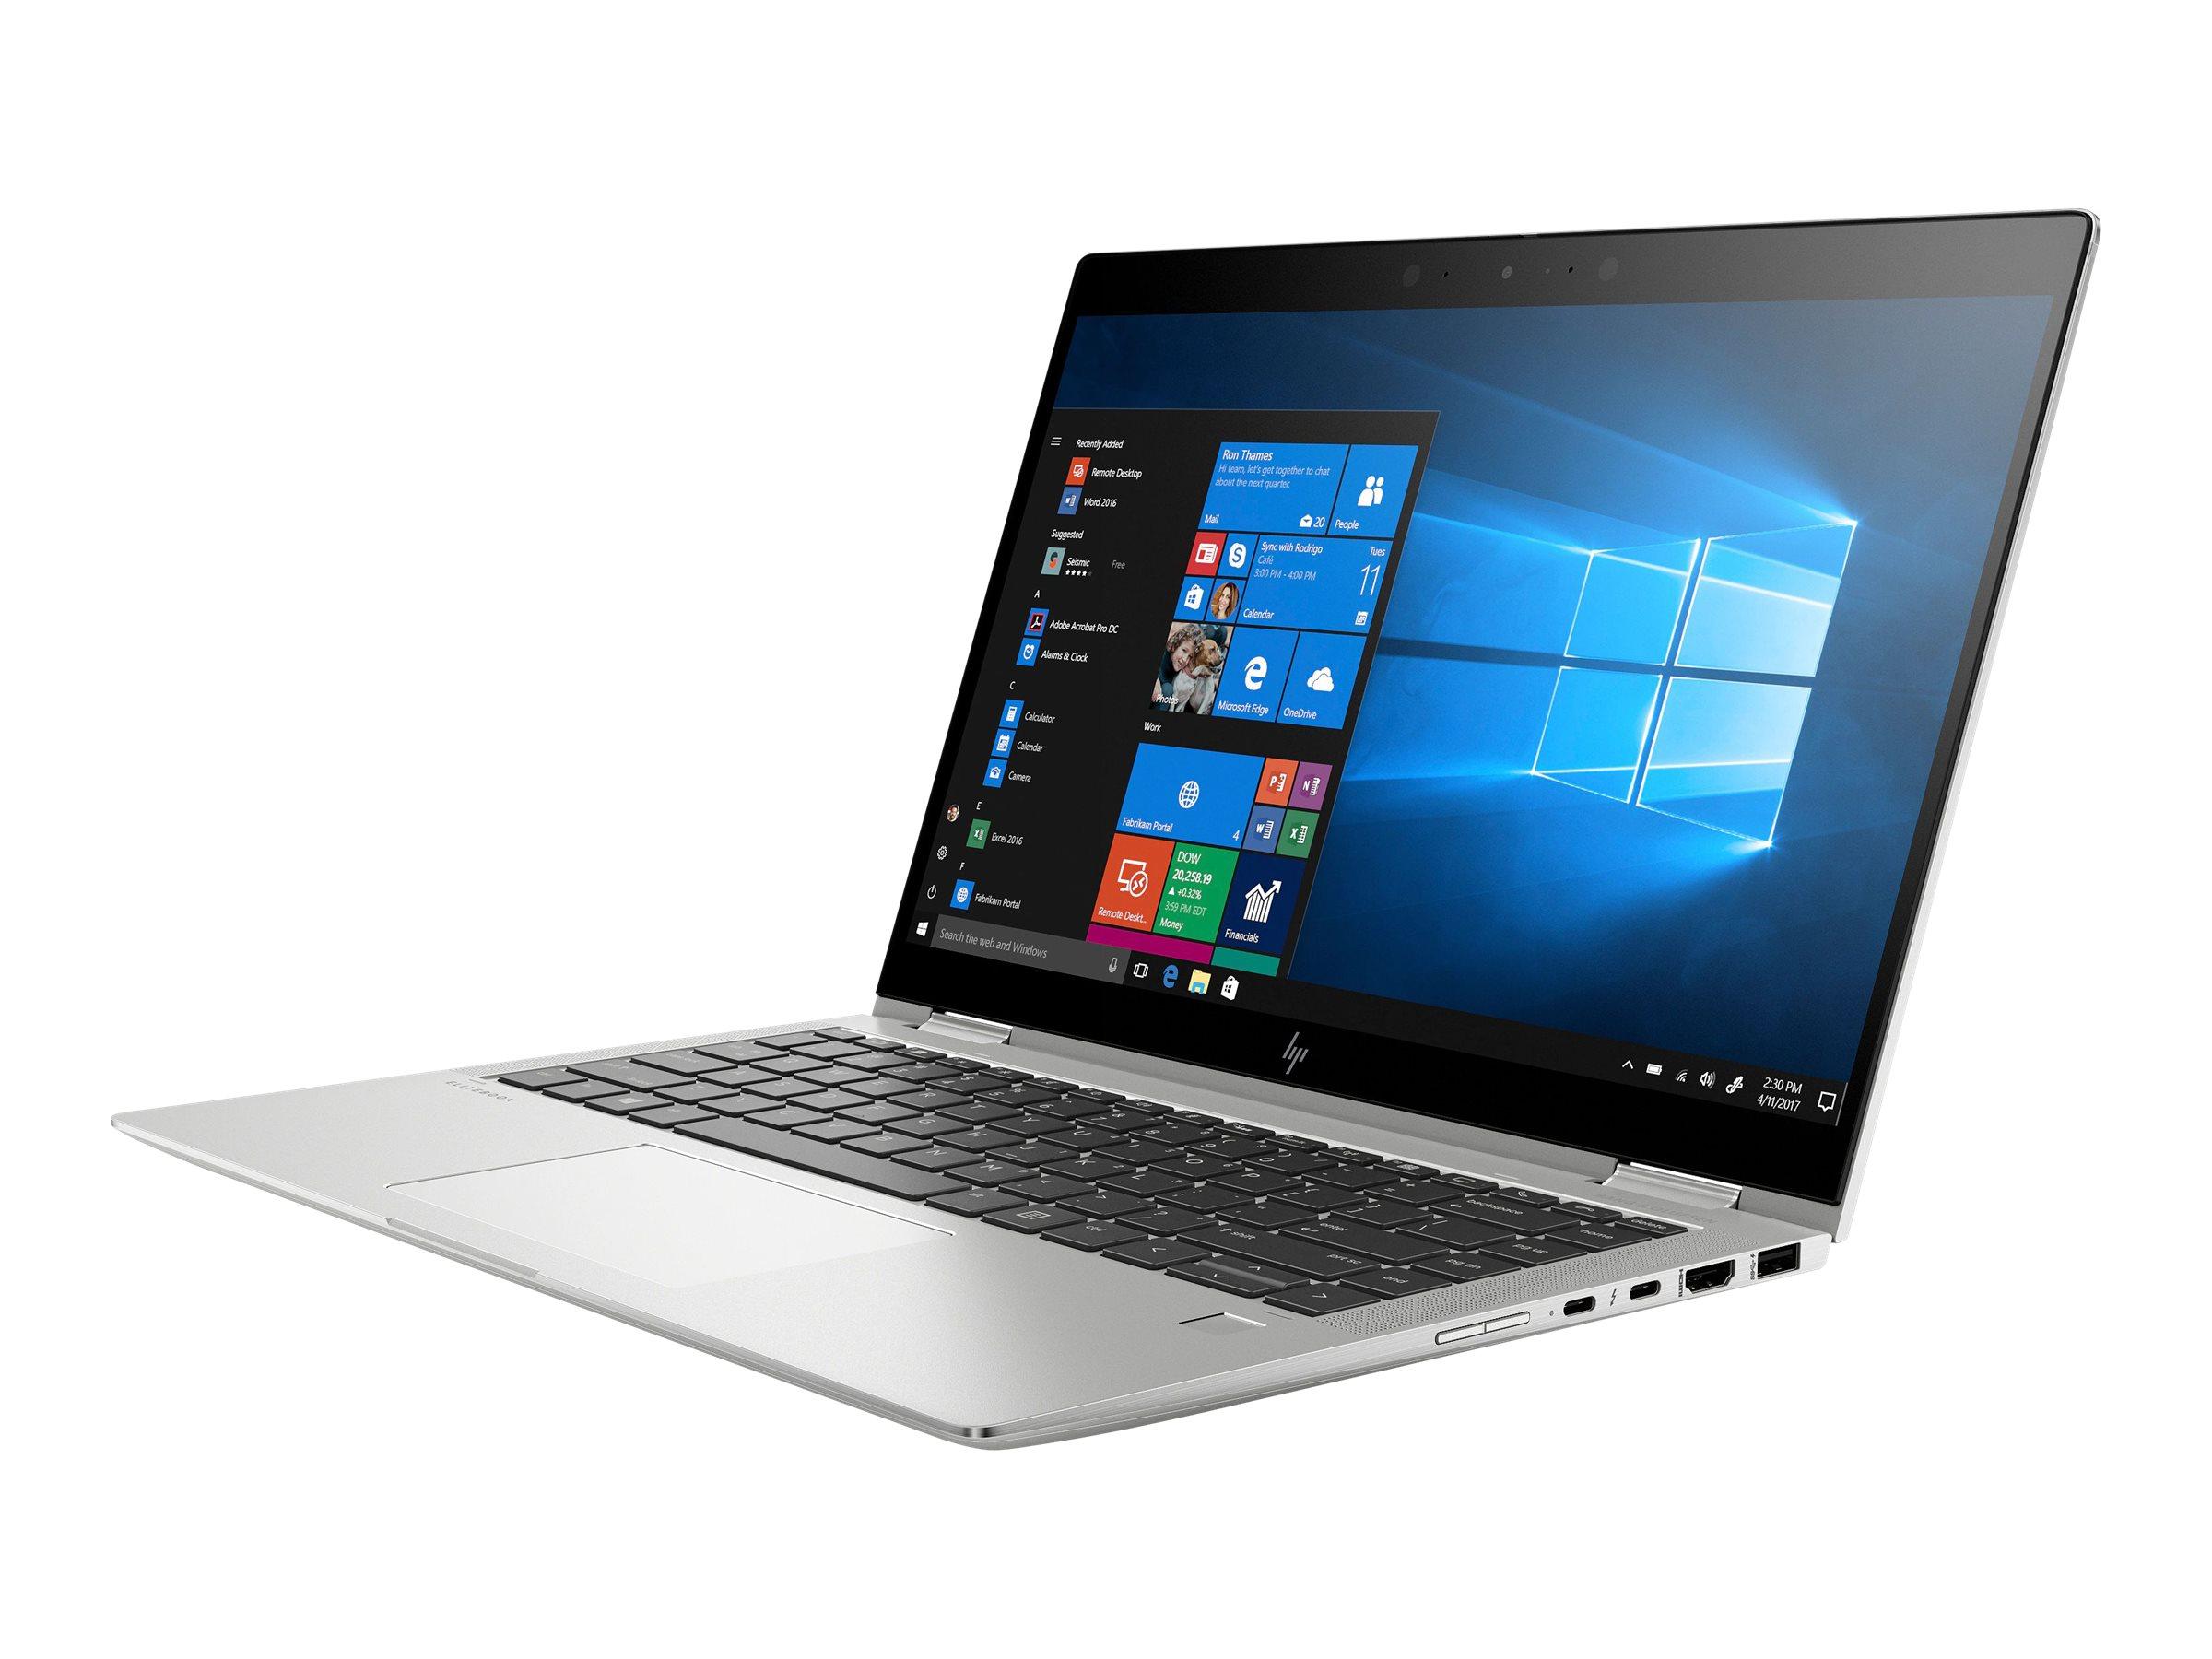 Hp elitebook x360 1040 g6 flip design core i5 8265u 1 6 ghz win 10 pro 64 bit 8 gb ram 256 gb ssd nvme hp value 11705733 7kn35ea abd